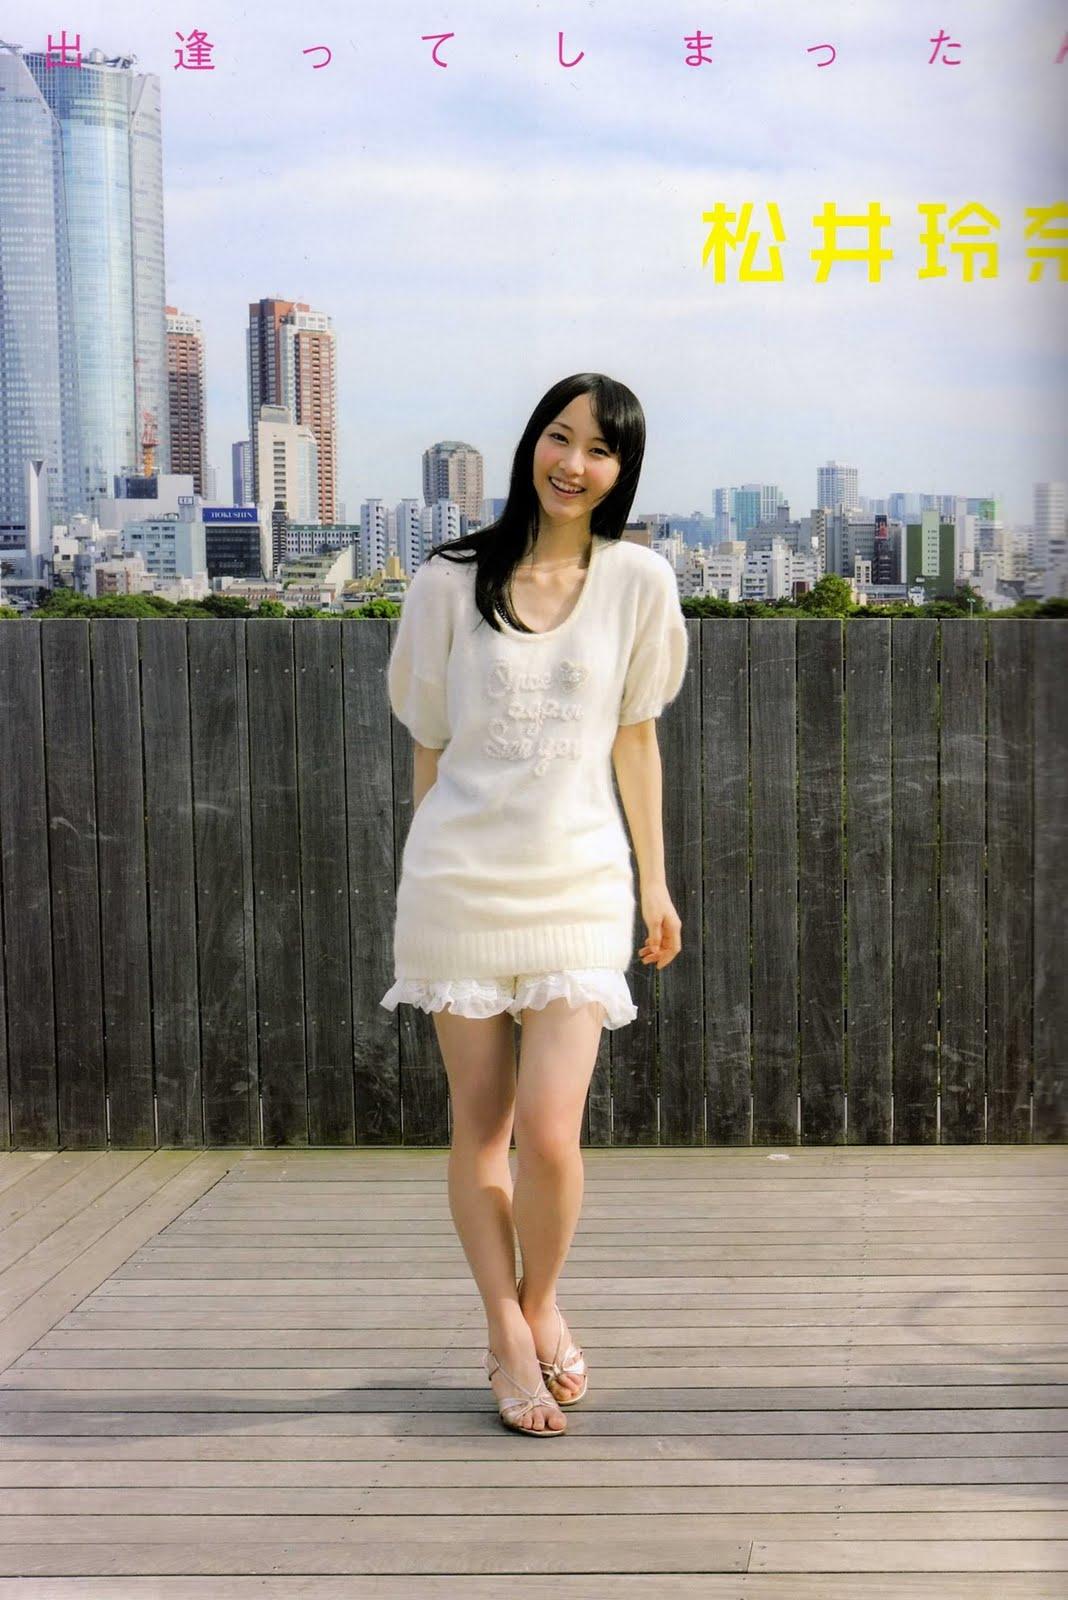 Summer girls 2010 vol 1 doki onna darake no ero bikini taikai scene 4